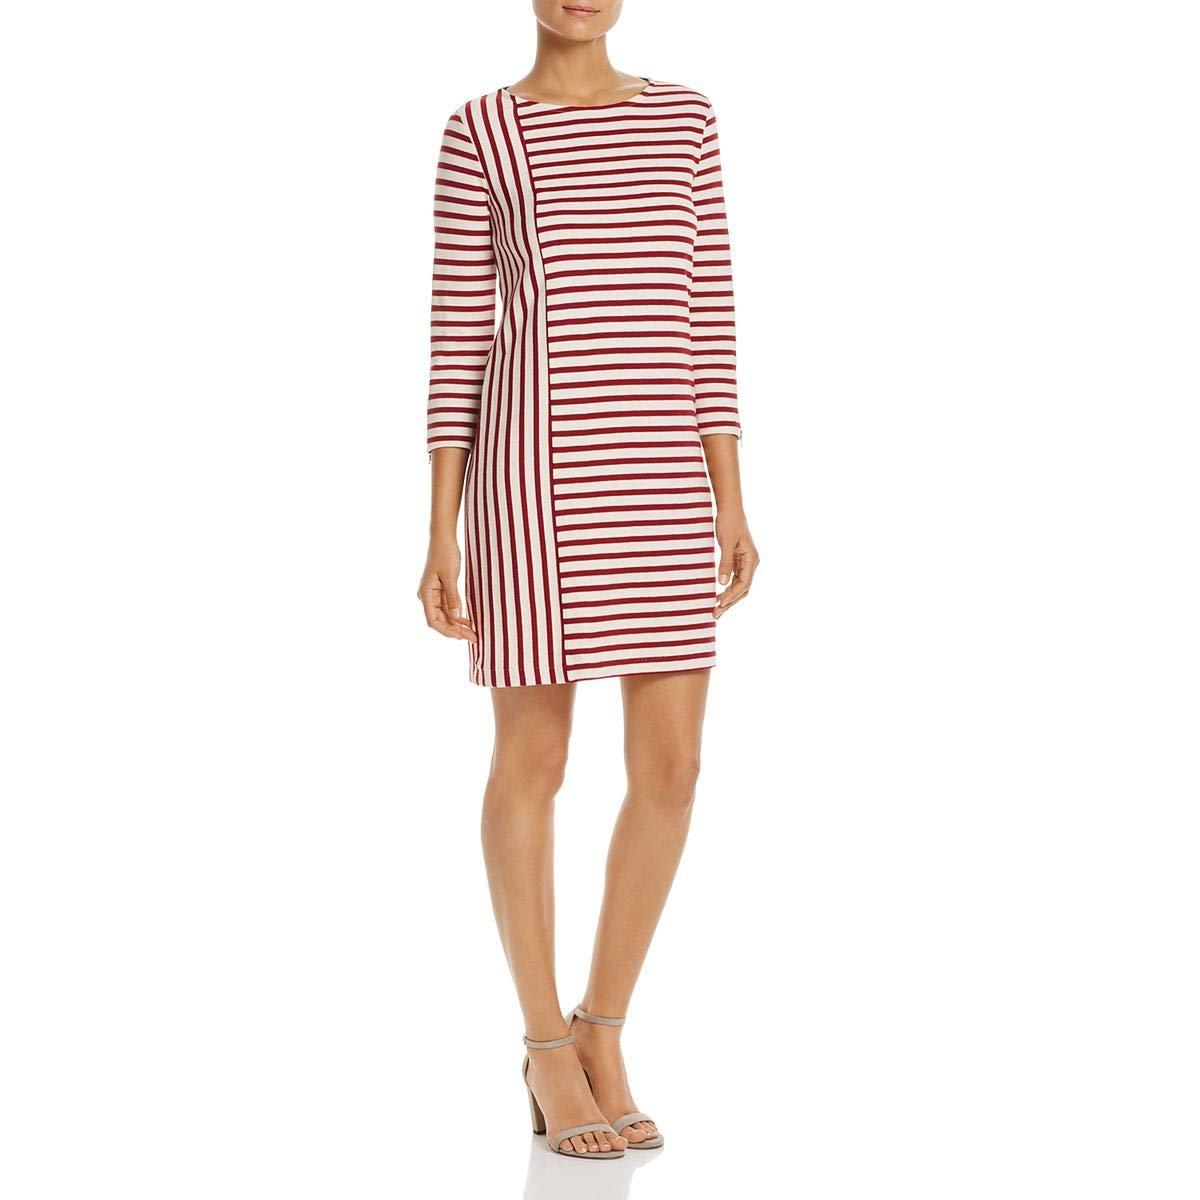 Available at Amazon: Three Dots Women's Stripe Combo Shift Mid Loose Dress